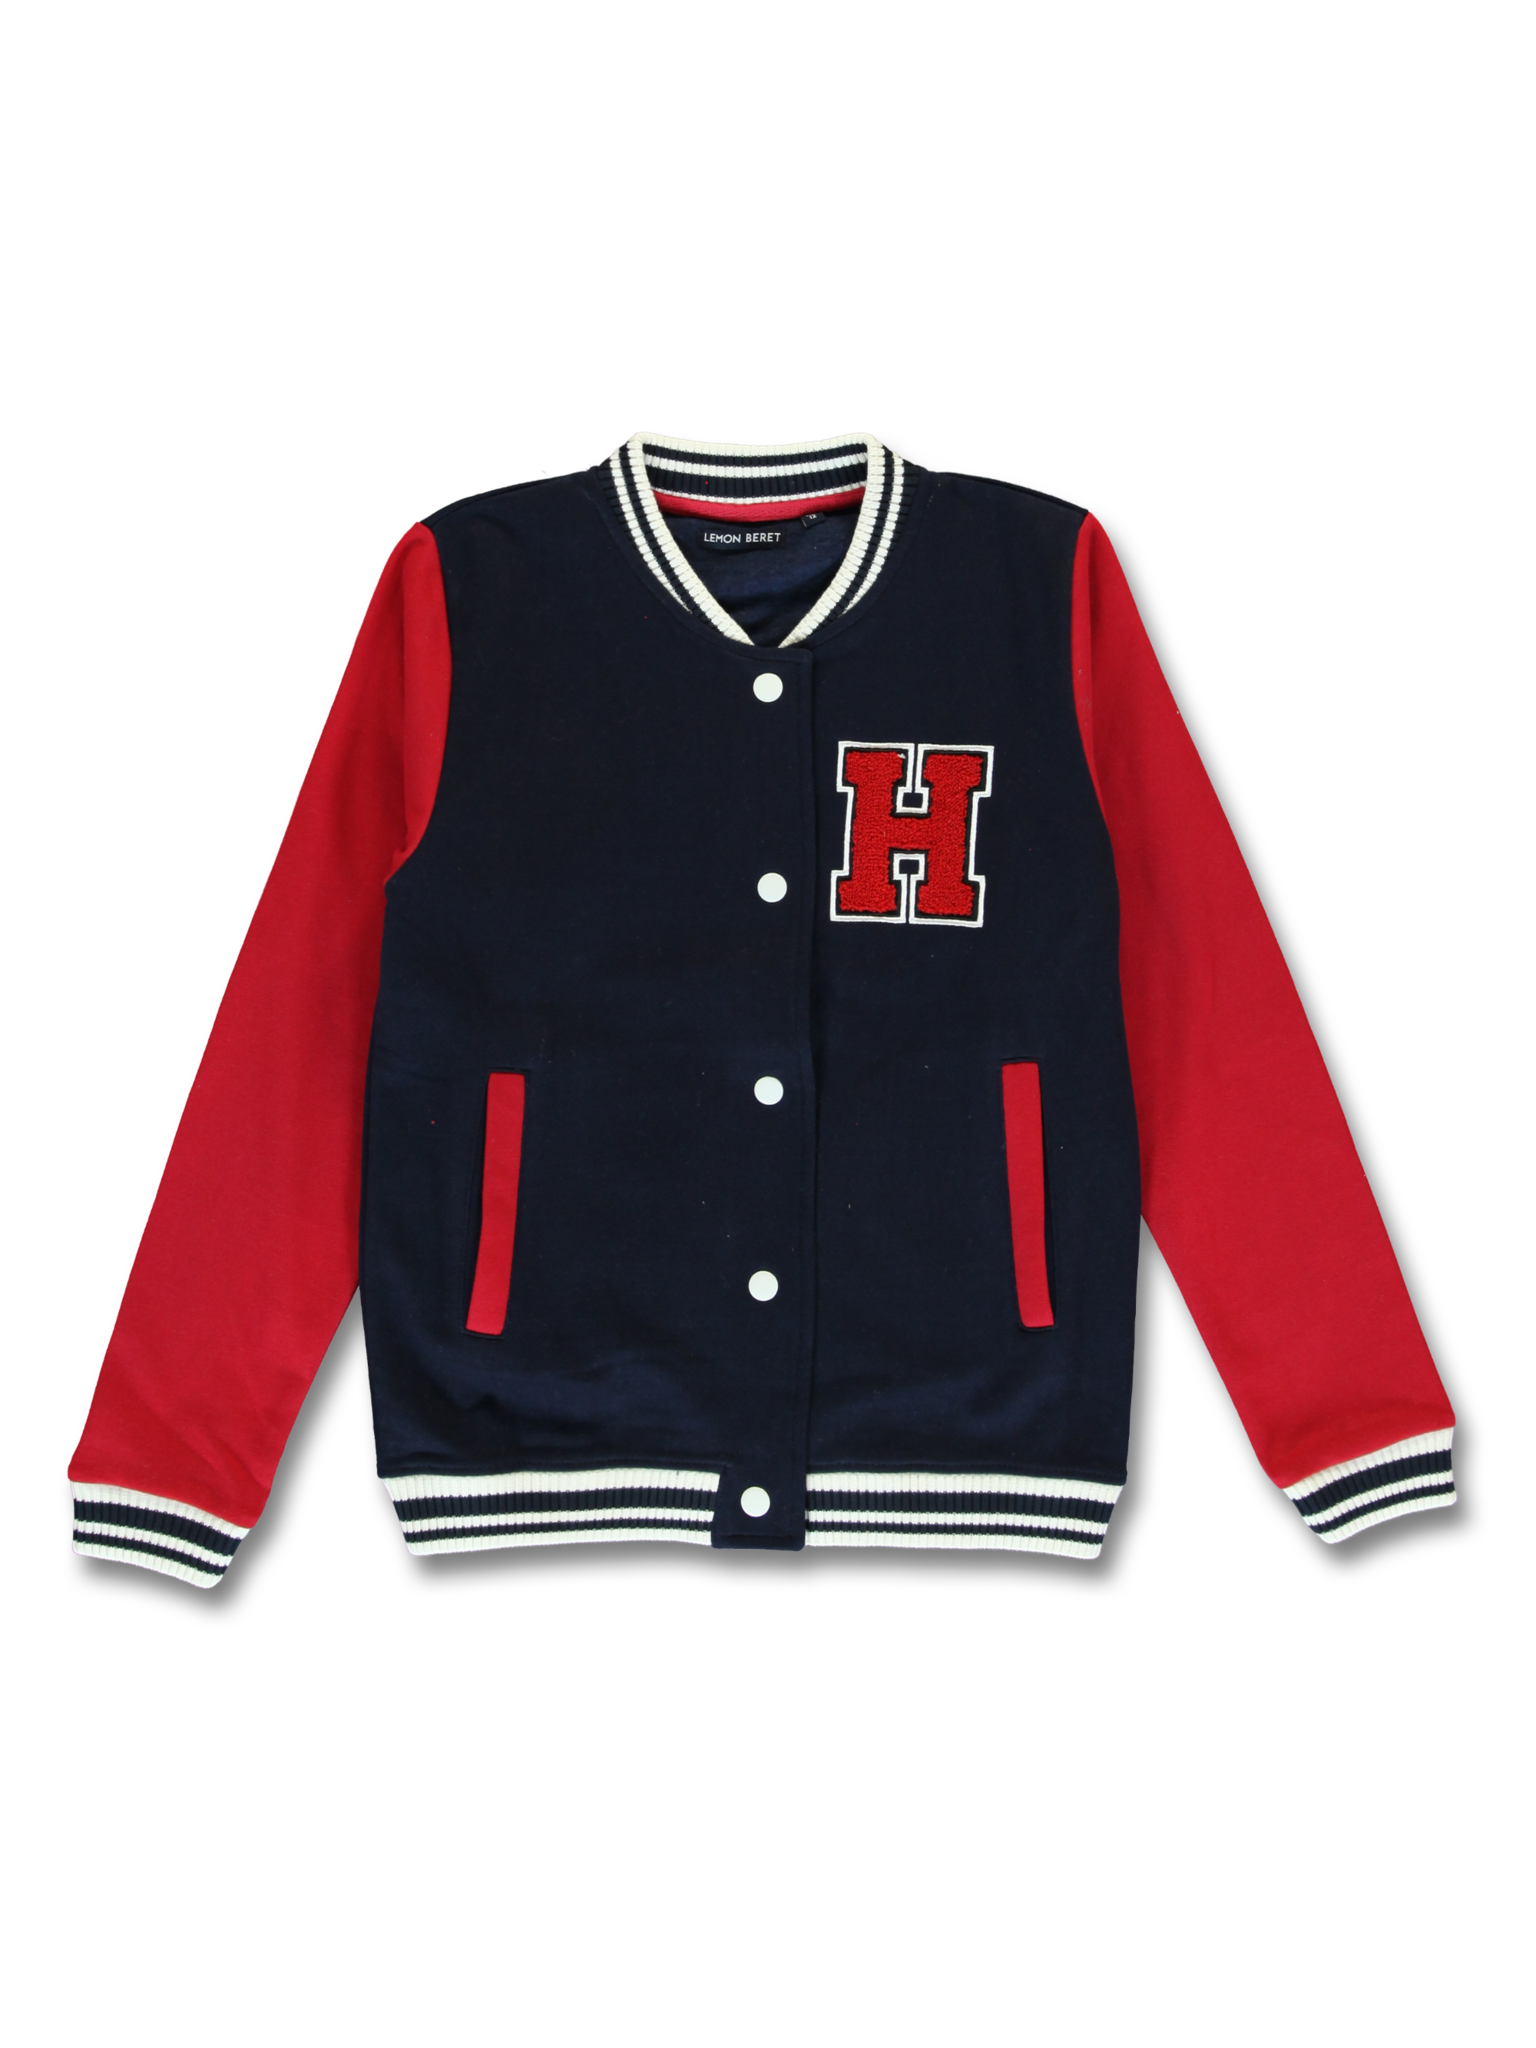 All Brands | Winterproducts Teen Girls | Cardigan Sweater | 12 pcs/box